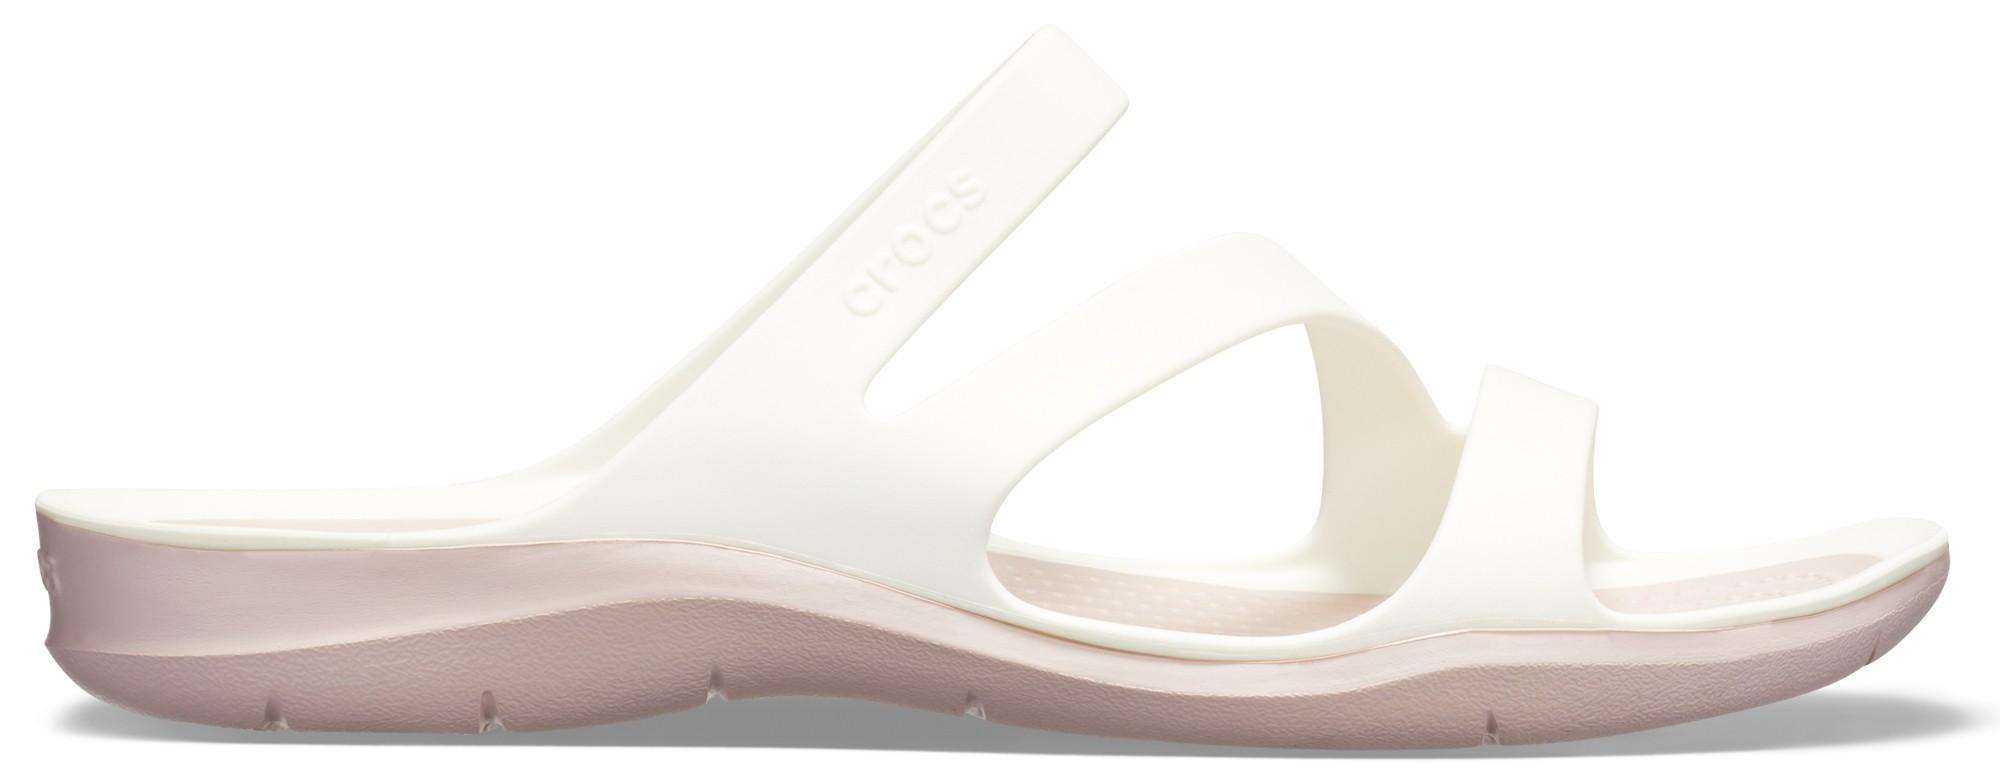 Crocs™ Women's Swiftwater Sandal White/Rose Dust 41